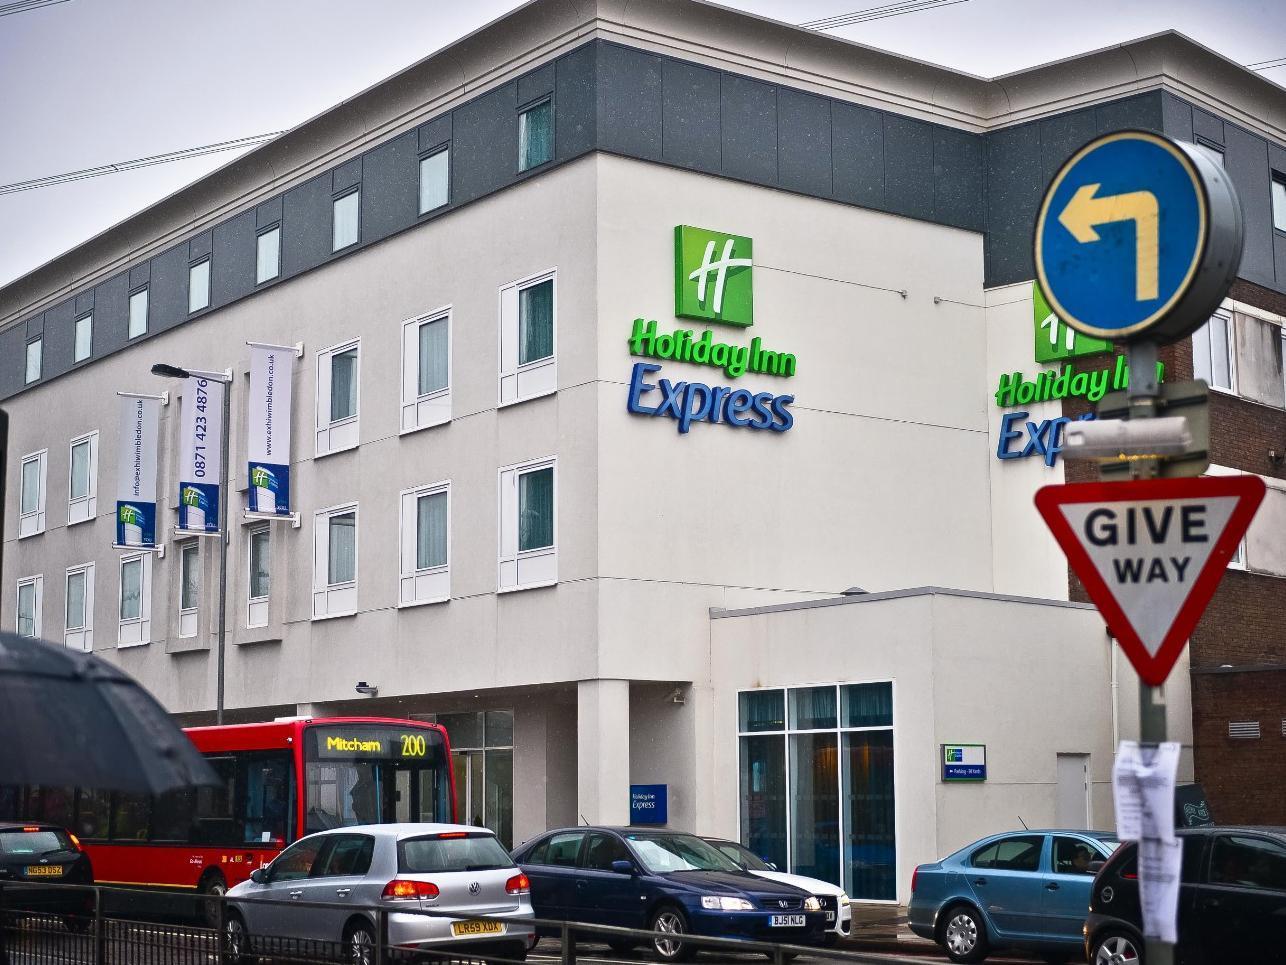 Holiday Inn Express London Wimbledon South